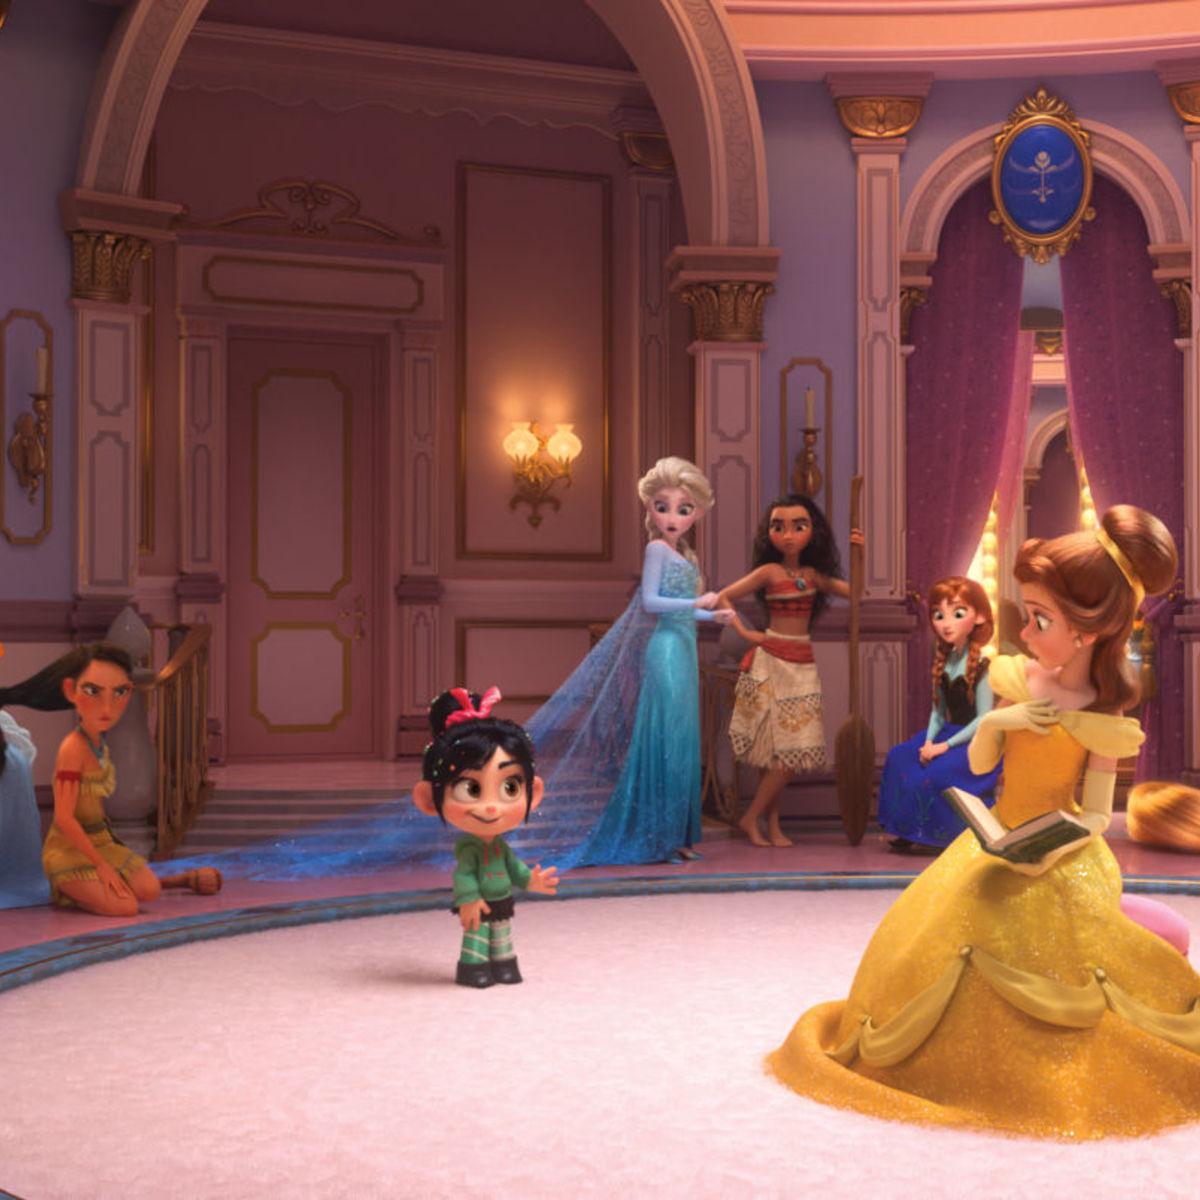 Disney Princesses Ralph Breaks the internet